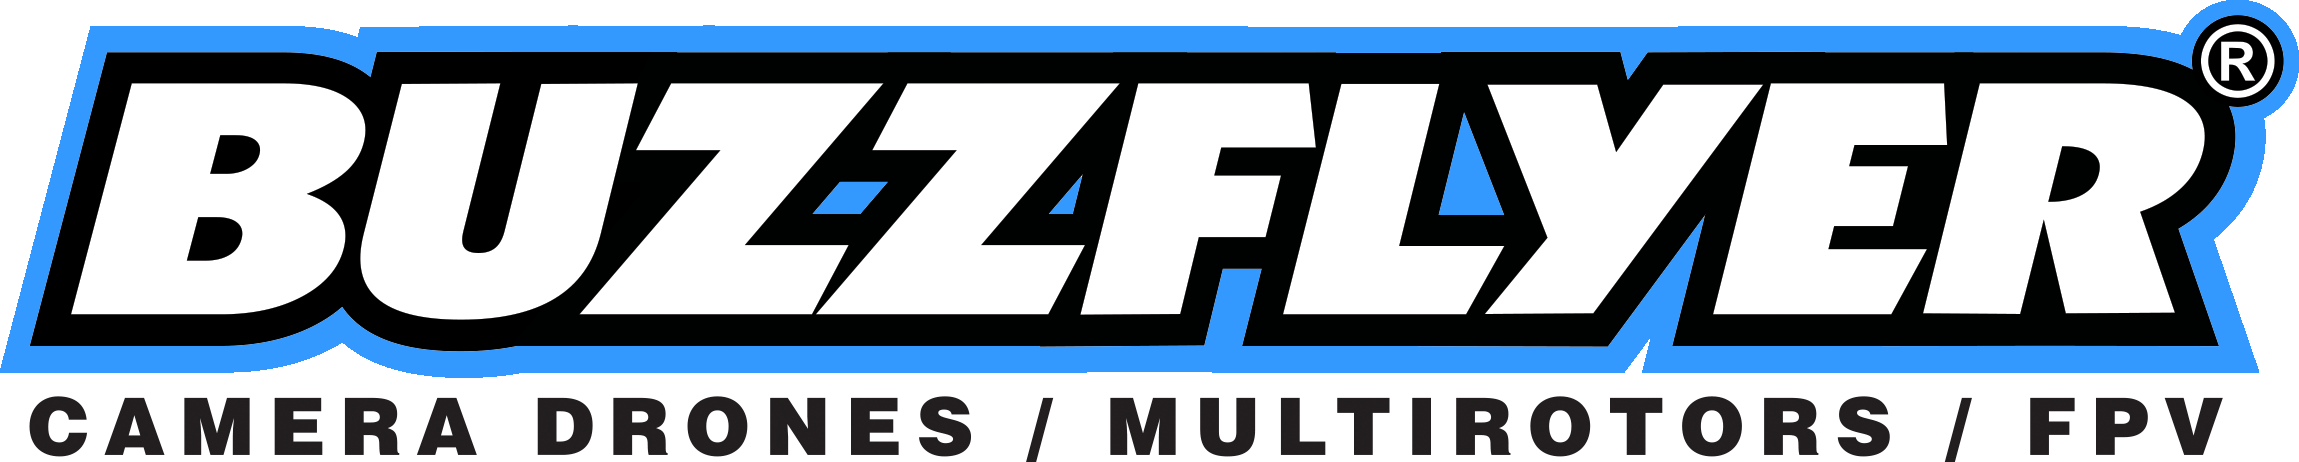 buzzflyer-logo-rgb.png